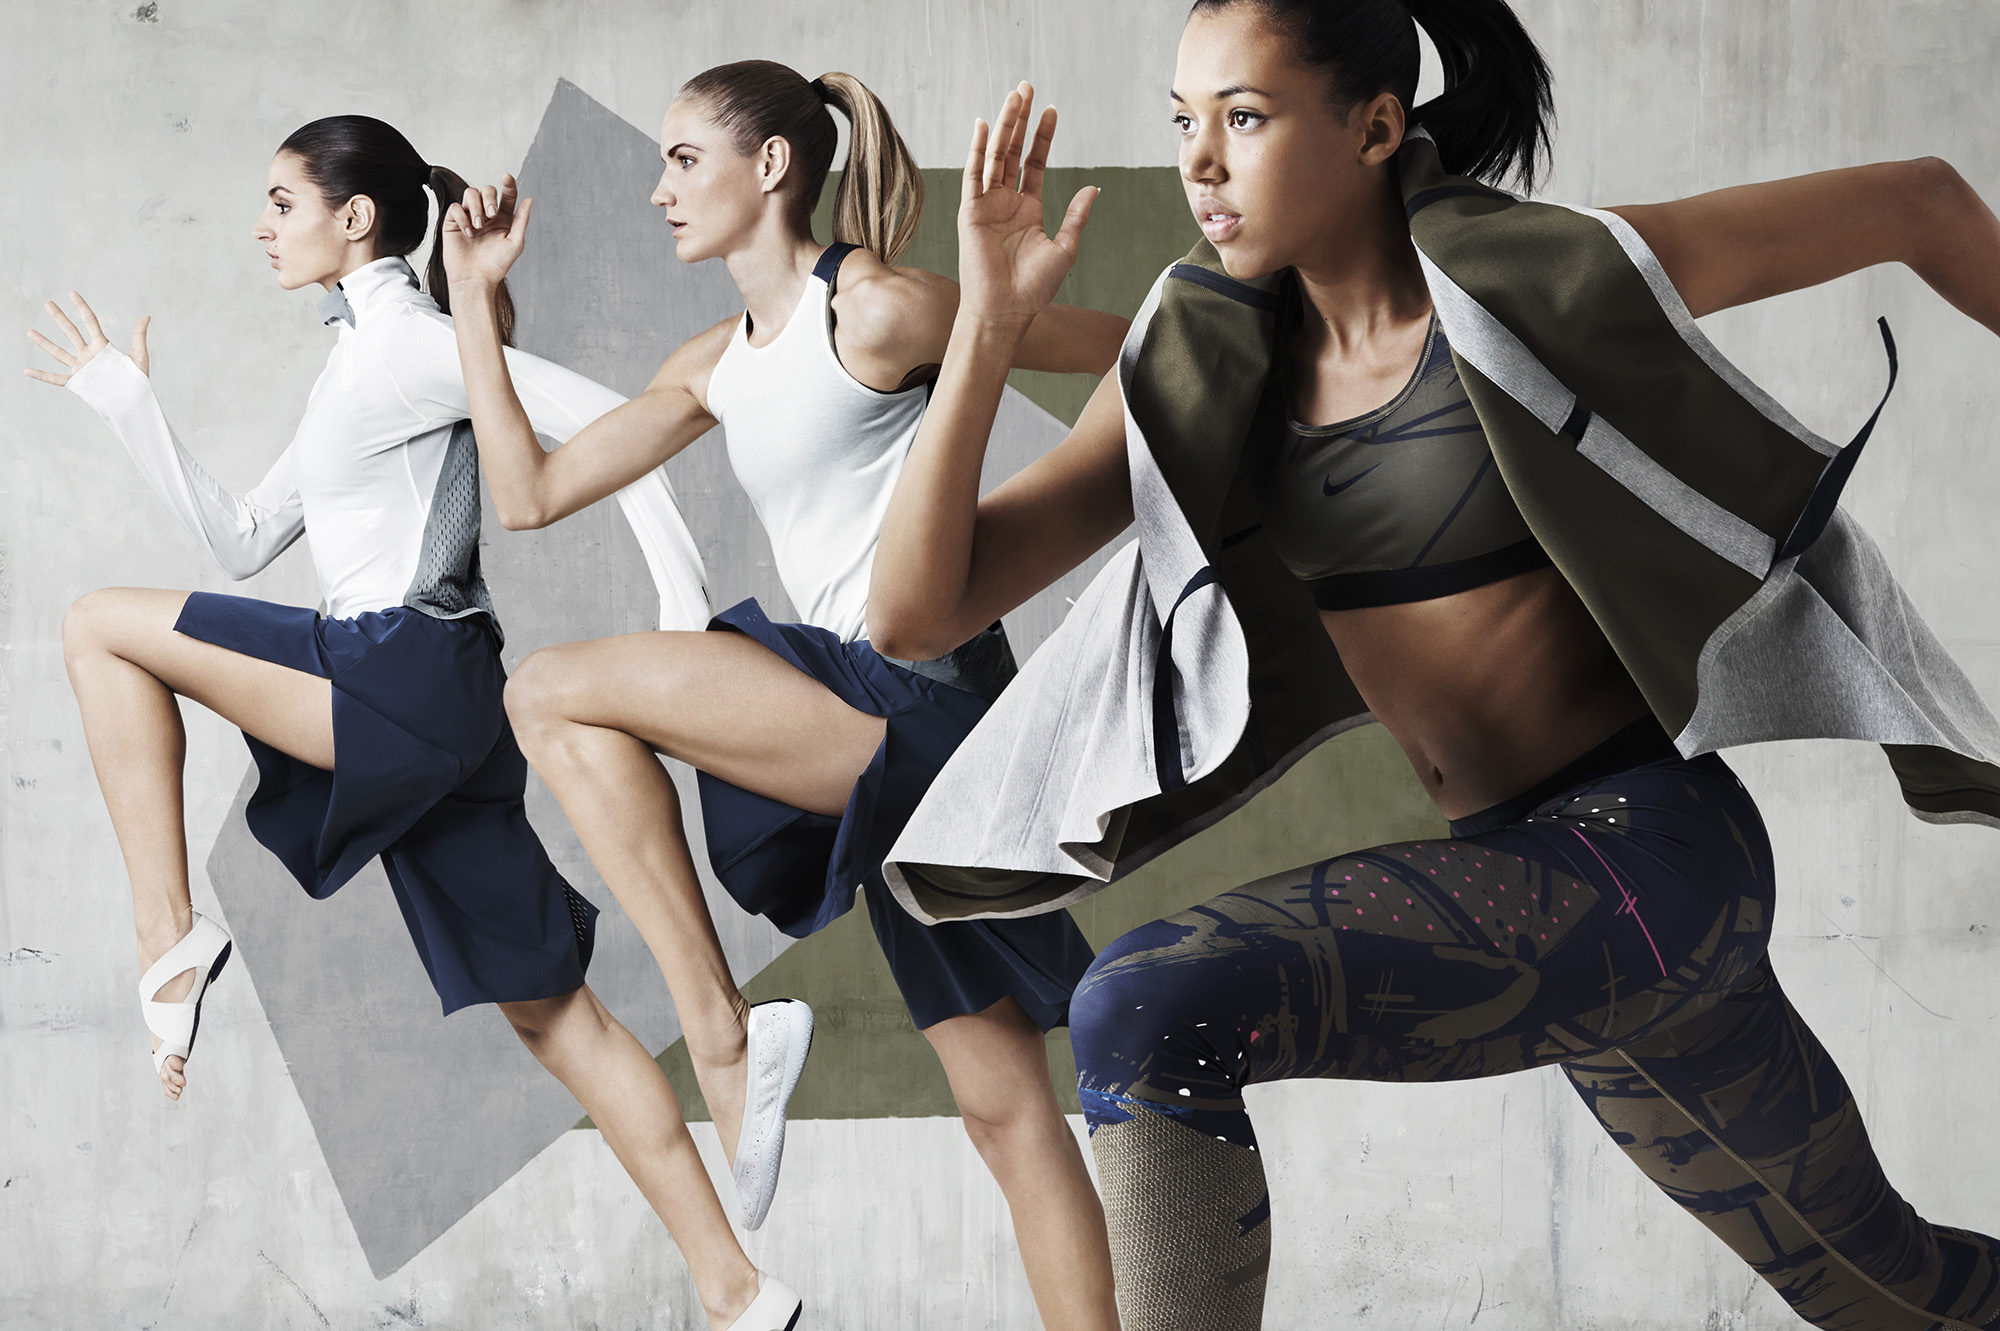 NikeLab_x_JFS_collection_36906